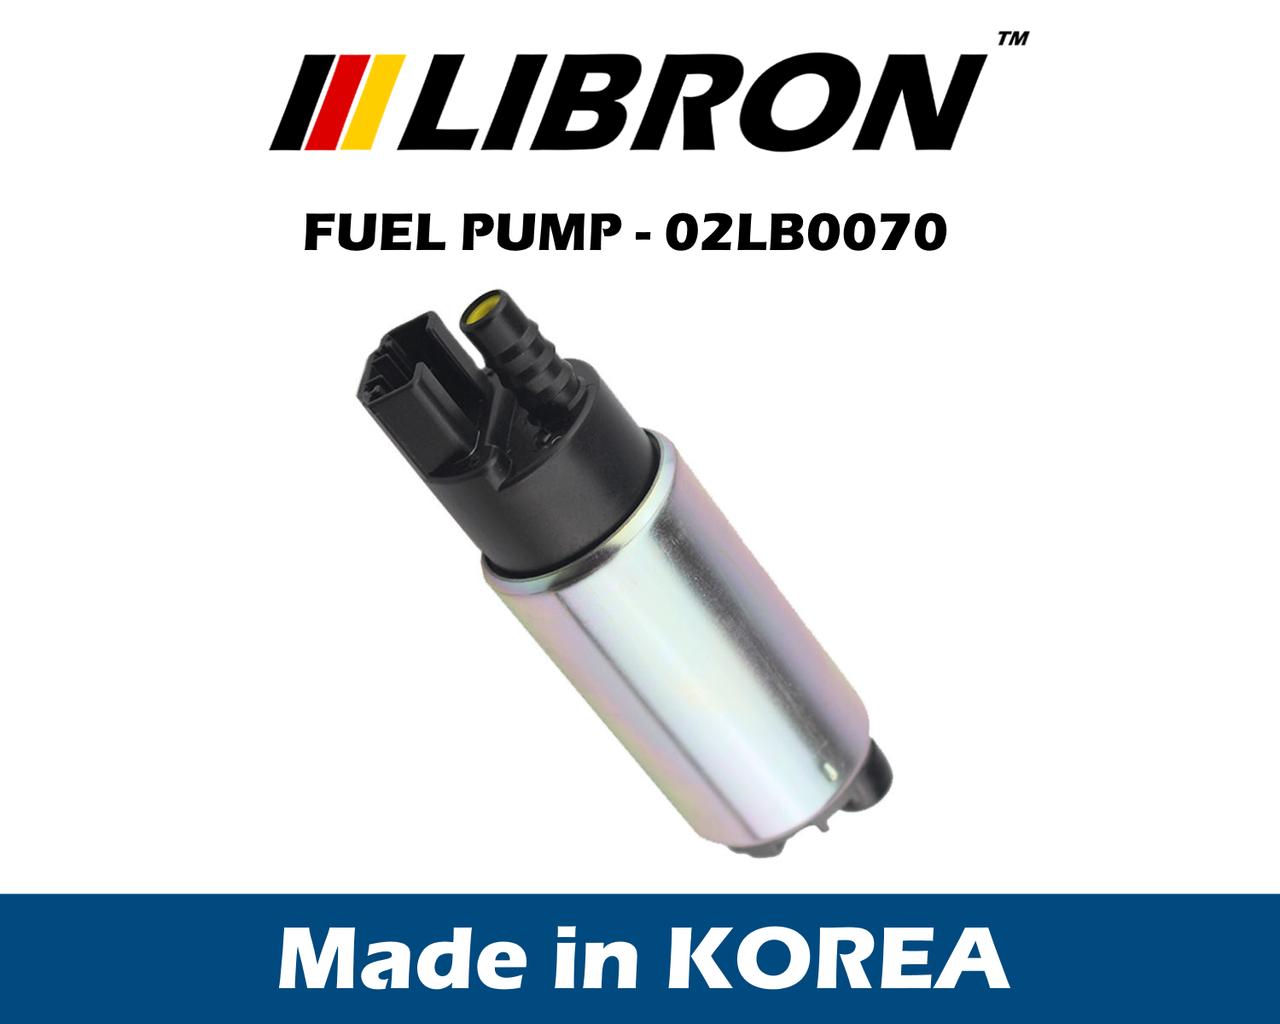 Бензонасос LIBRON 02LB0070 - SUZUKI SWIFT II (1989-2001)